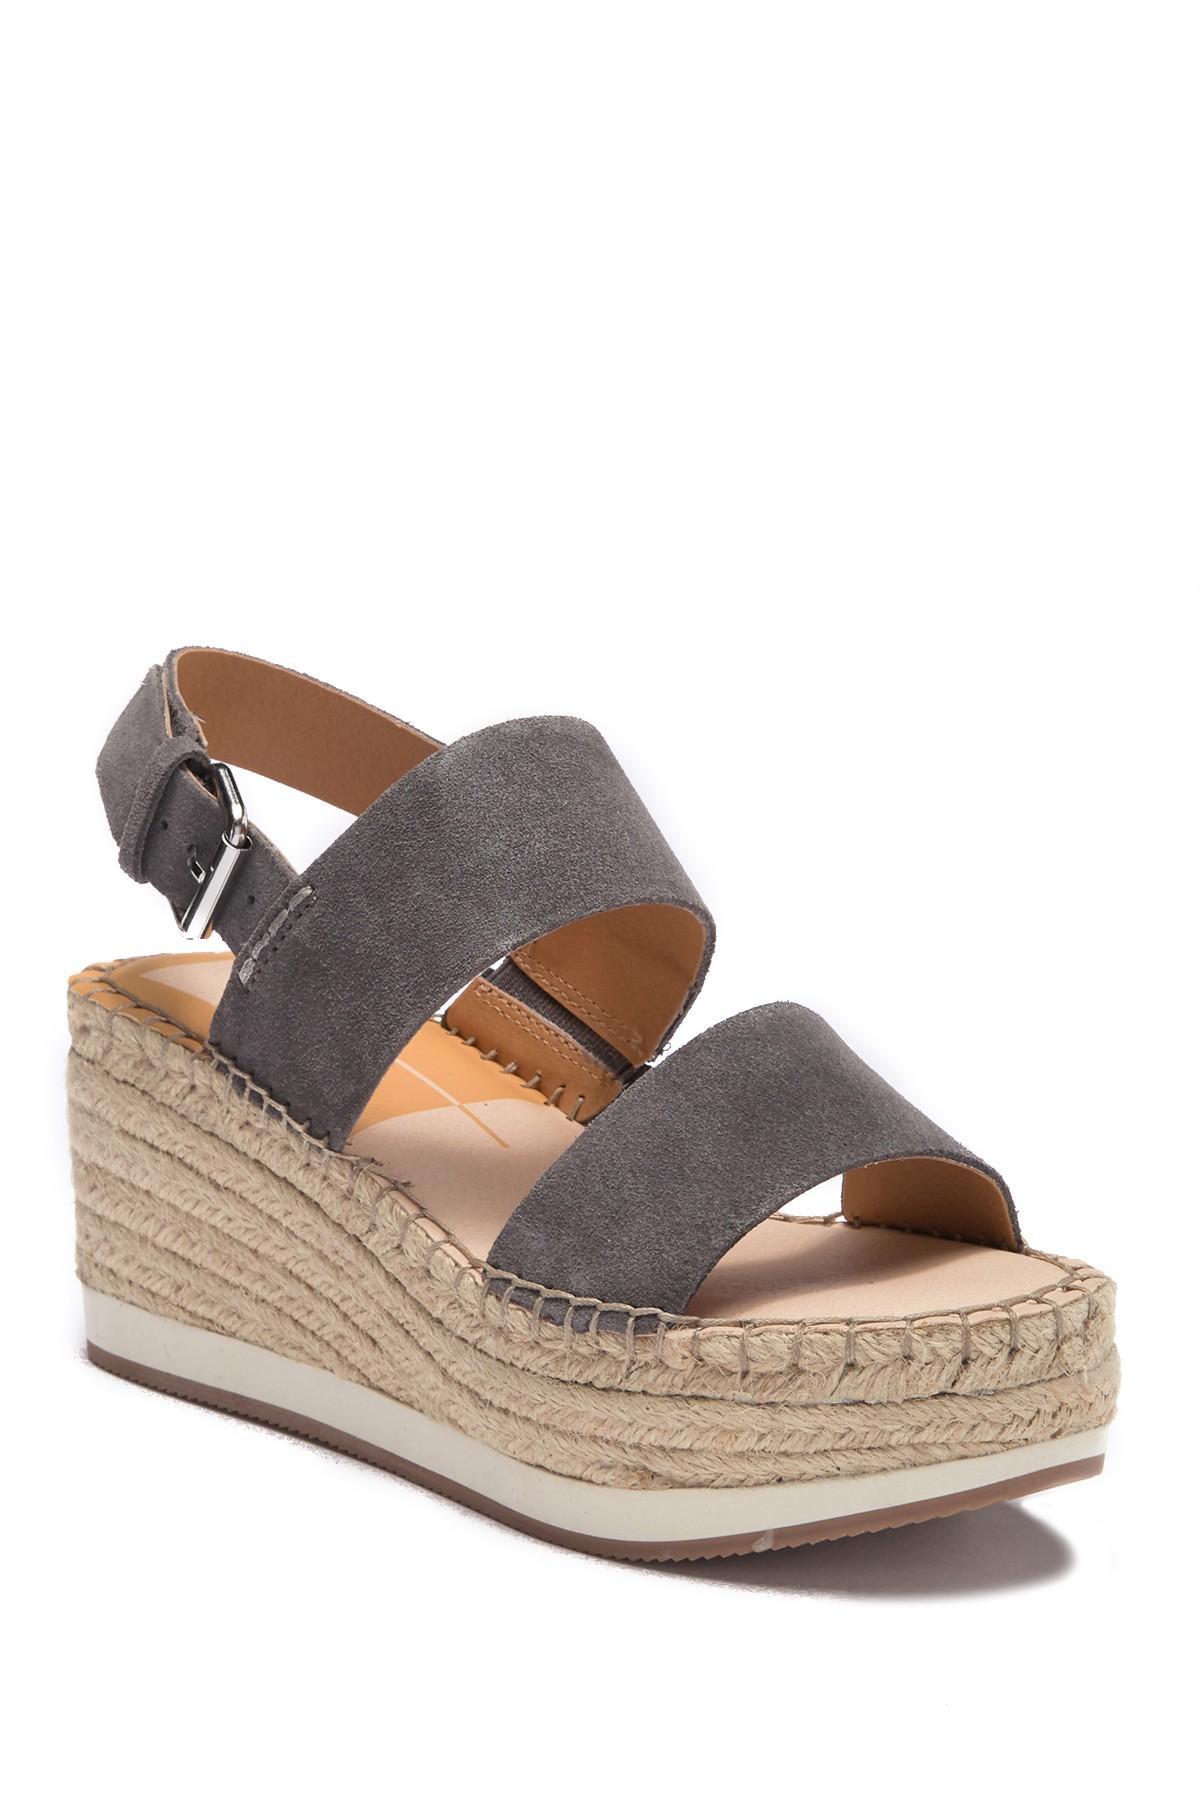 5342e16698f6 Dolce Vita. Women s Maggie Platform Espadrille Wedge Sandal